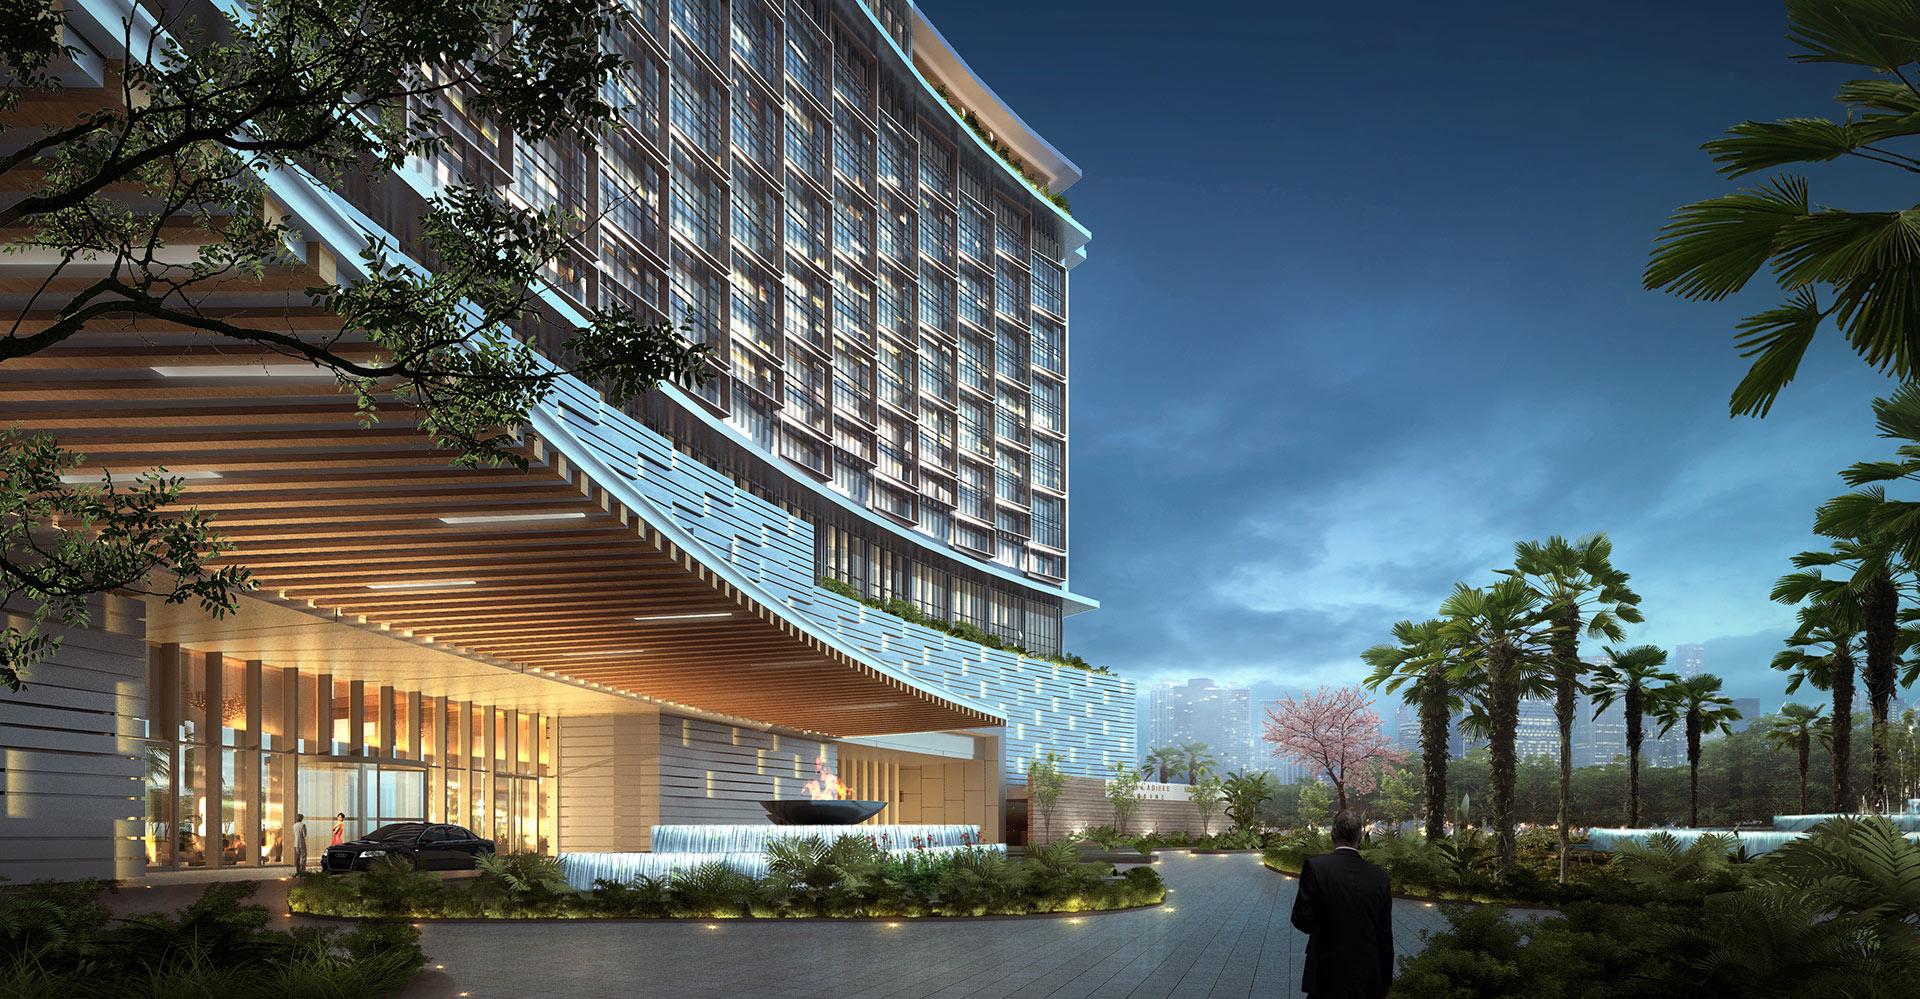 Chengdu Mixed-Use Development and Hyatt Regency Exterior 3